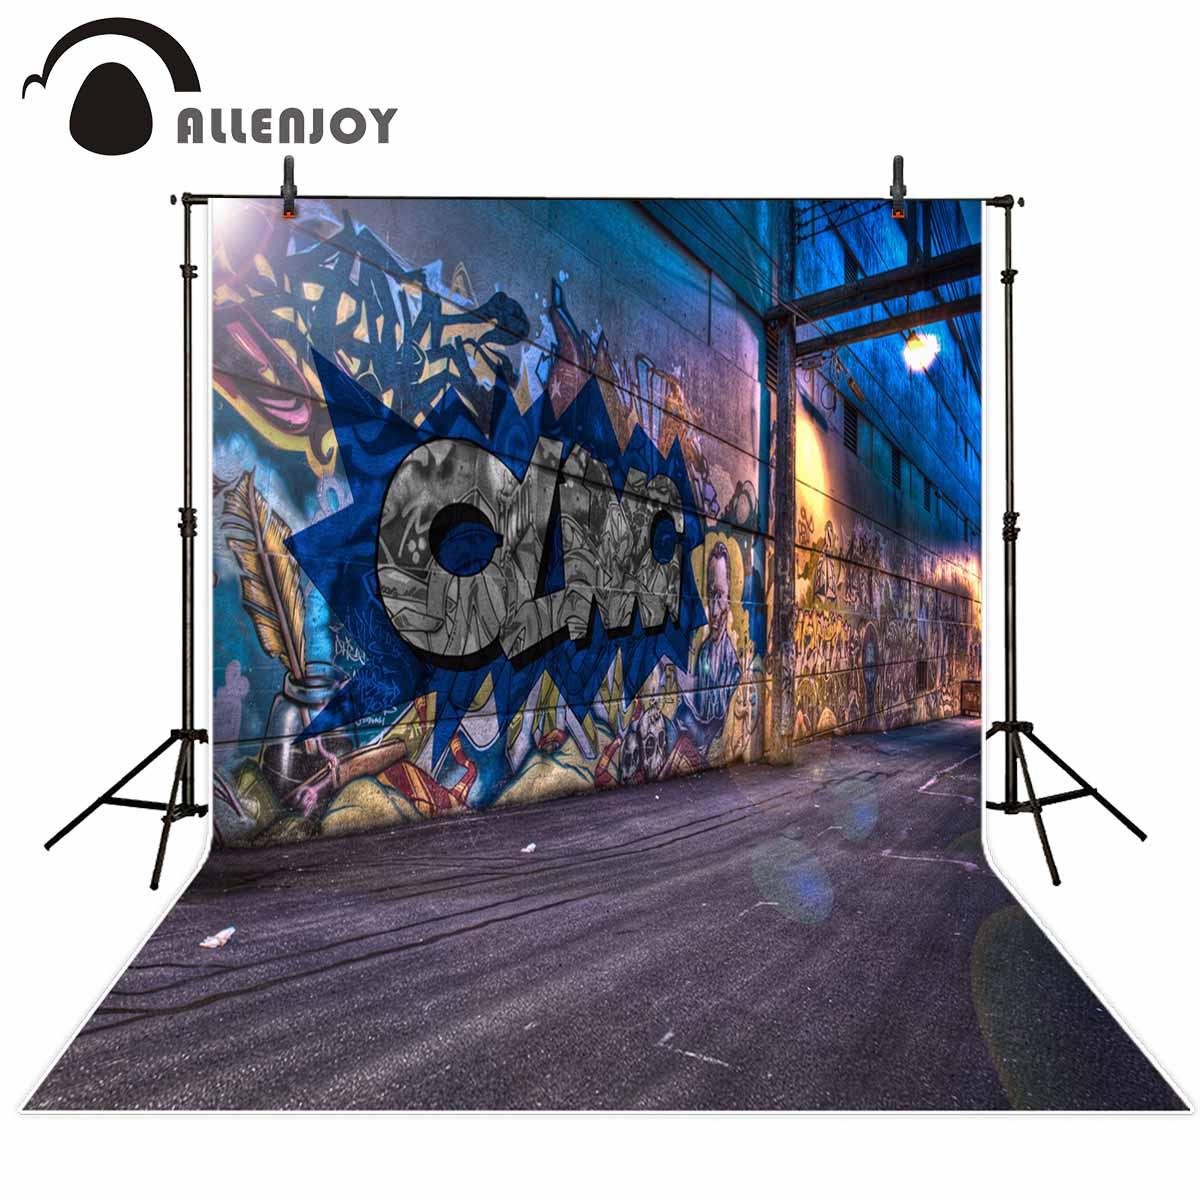 Unduh 570 Background Keren Jalanan HD Gratis